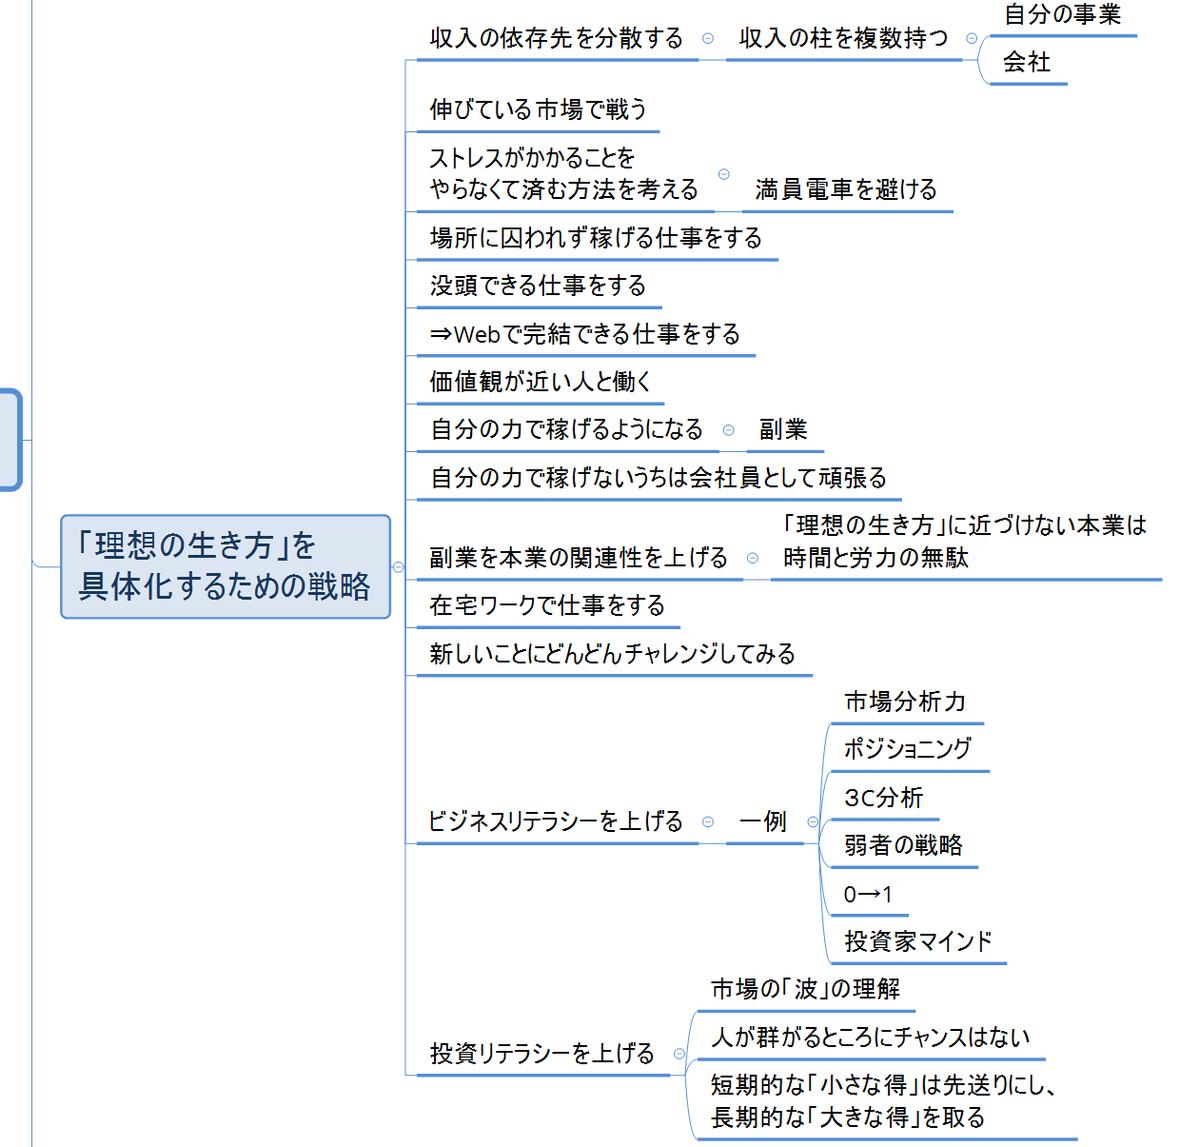 f:id:masaru-tanai:20200116123929p:plain